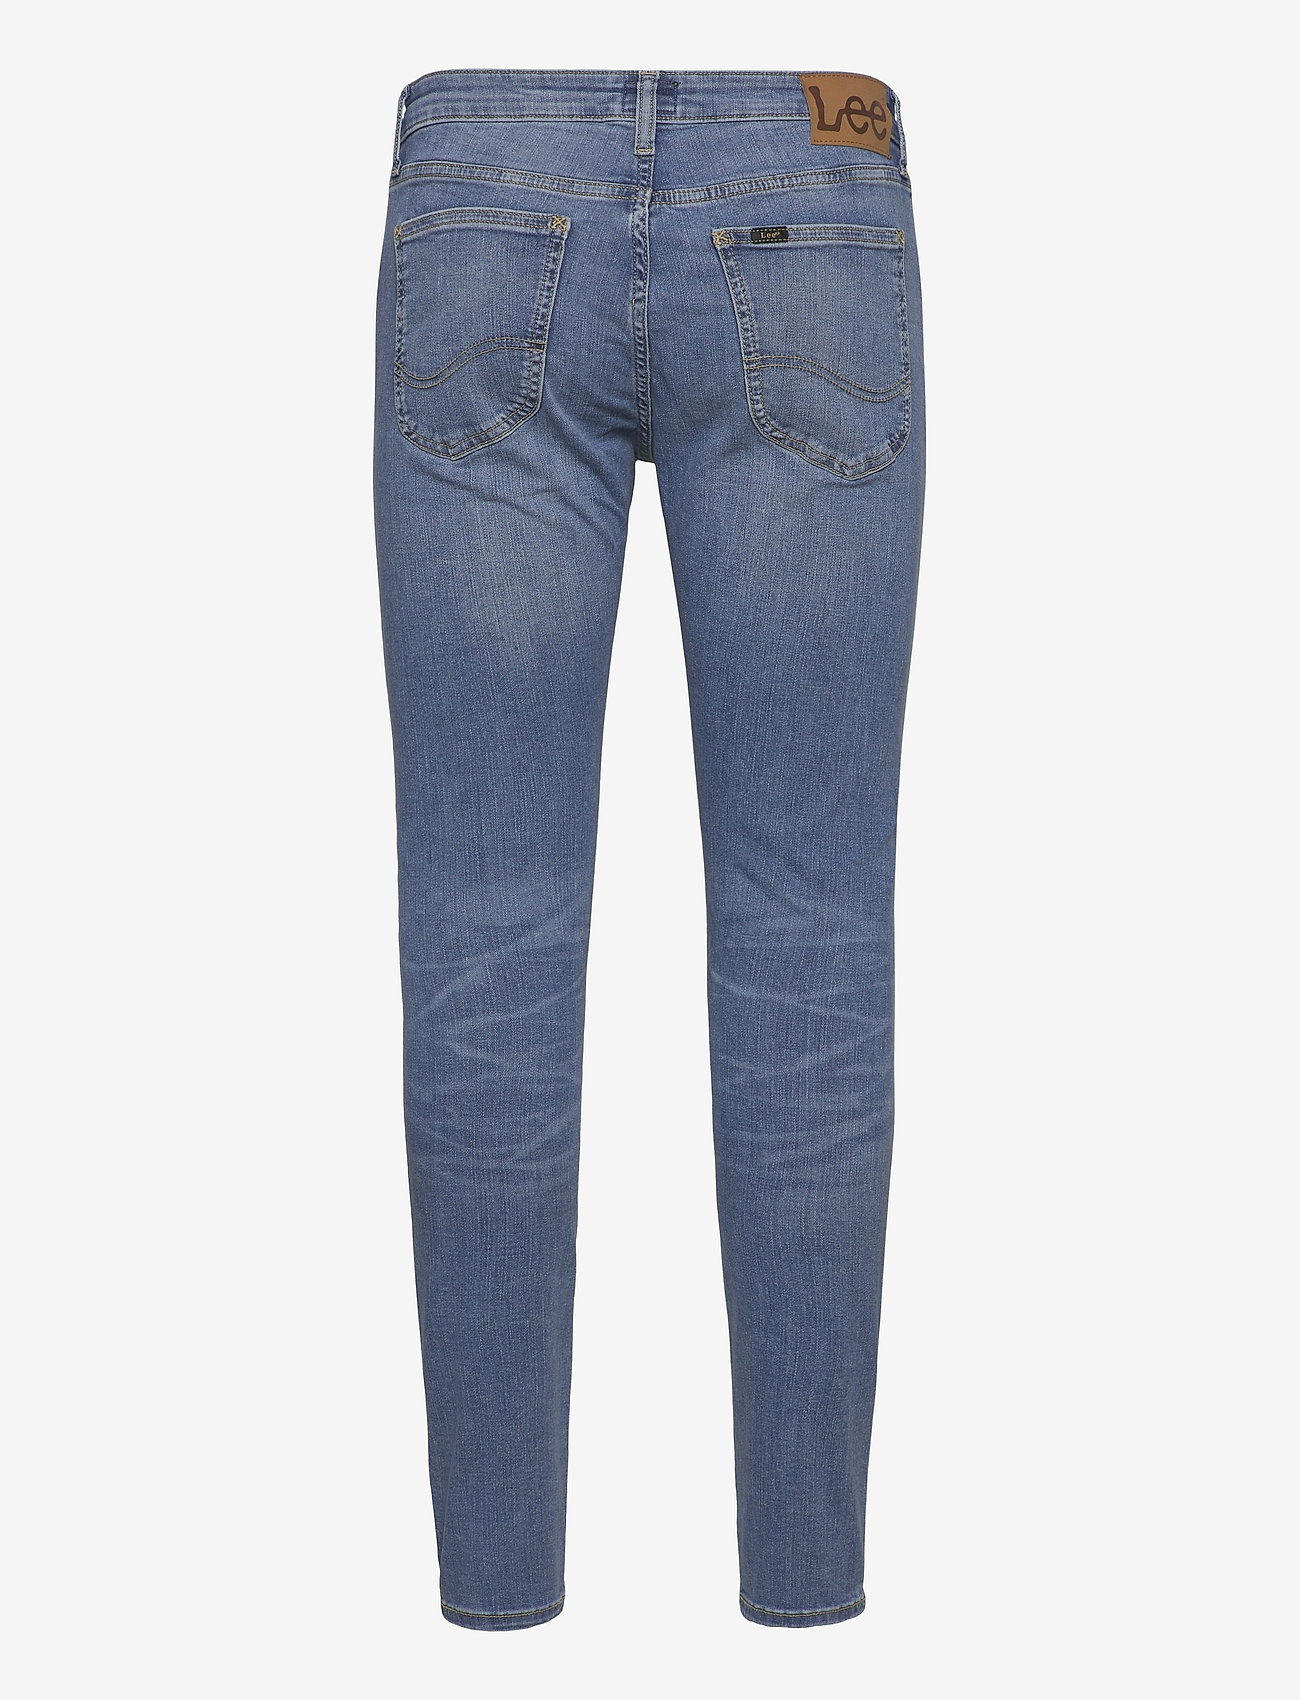 Lee Jeans - MALONE - skinny jeans - worn lonepine - 1